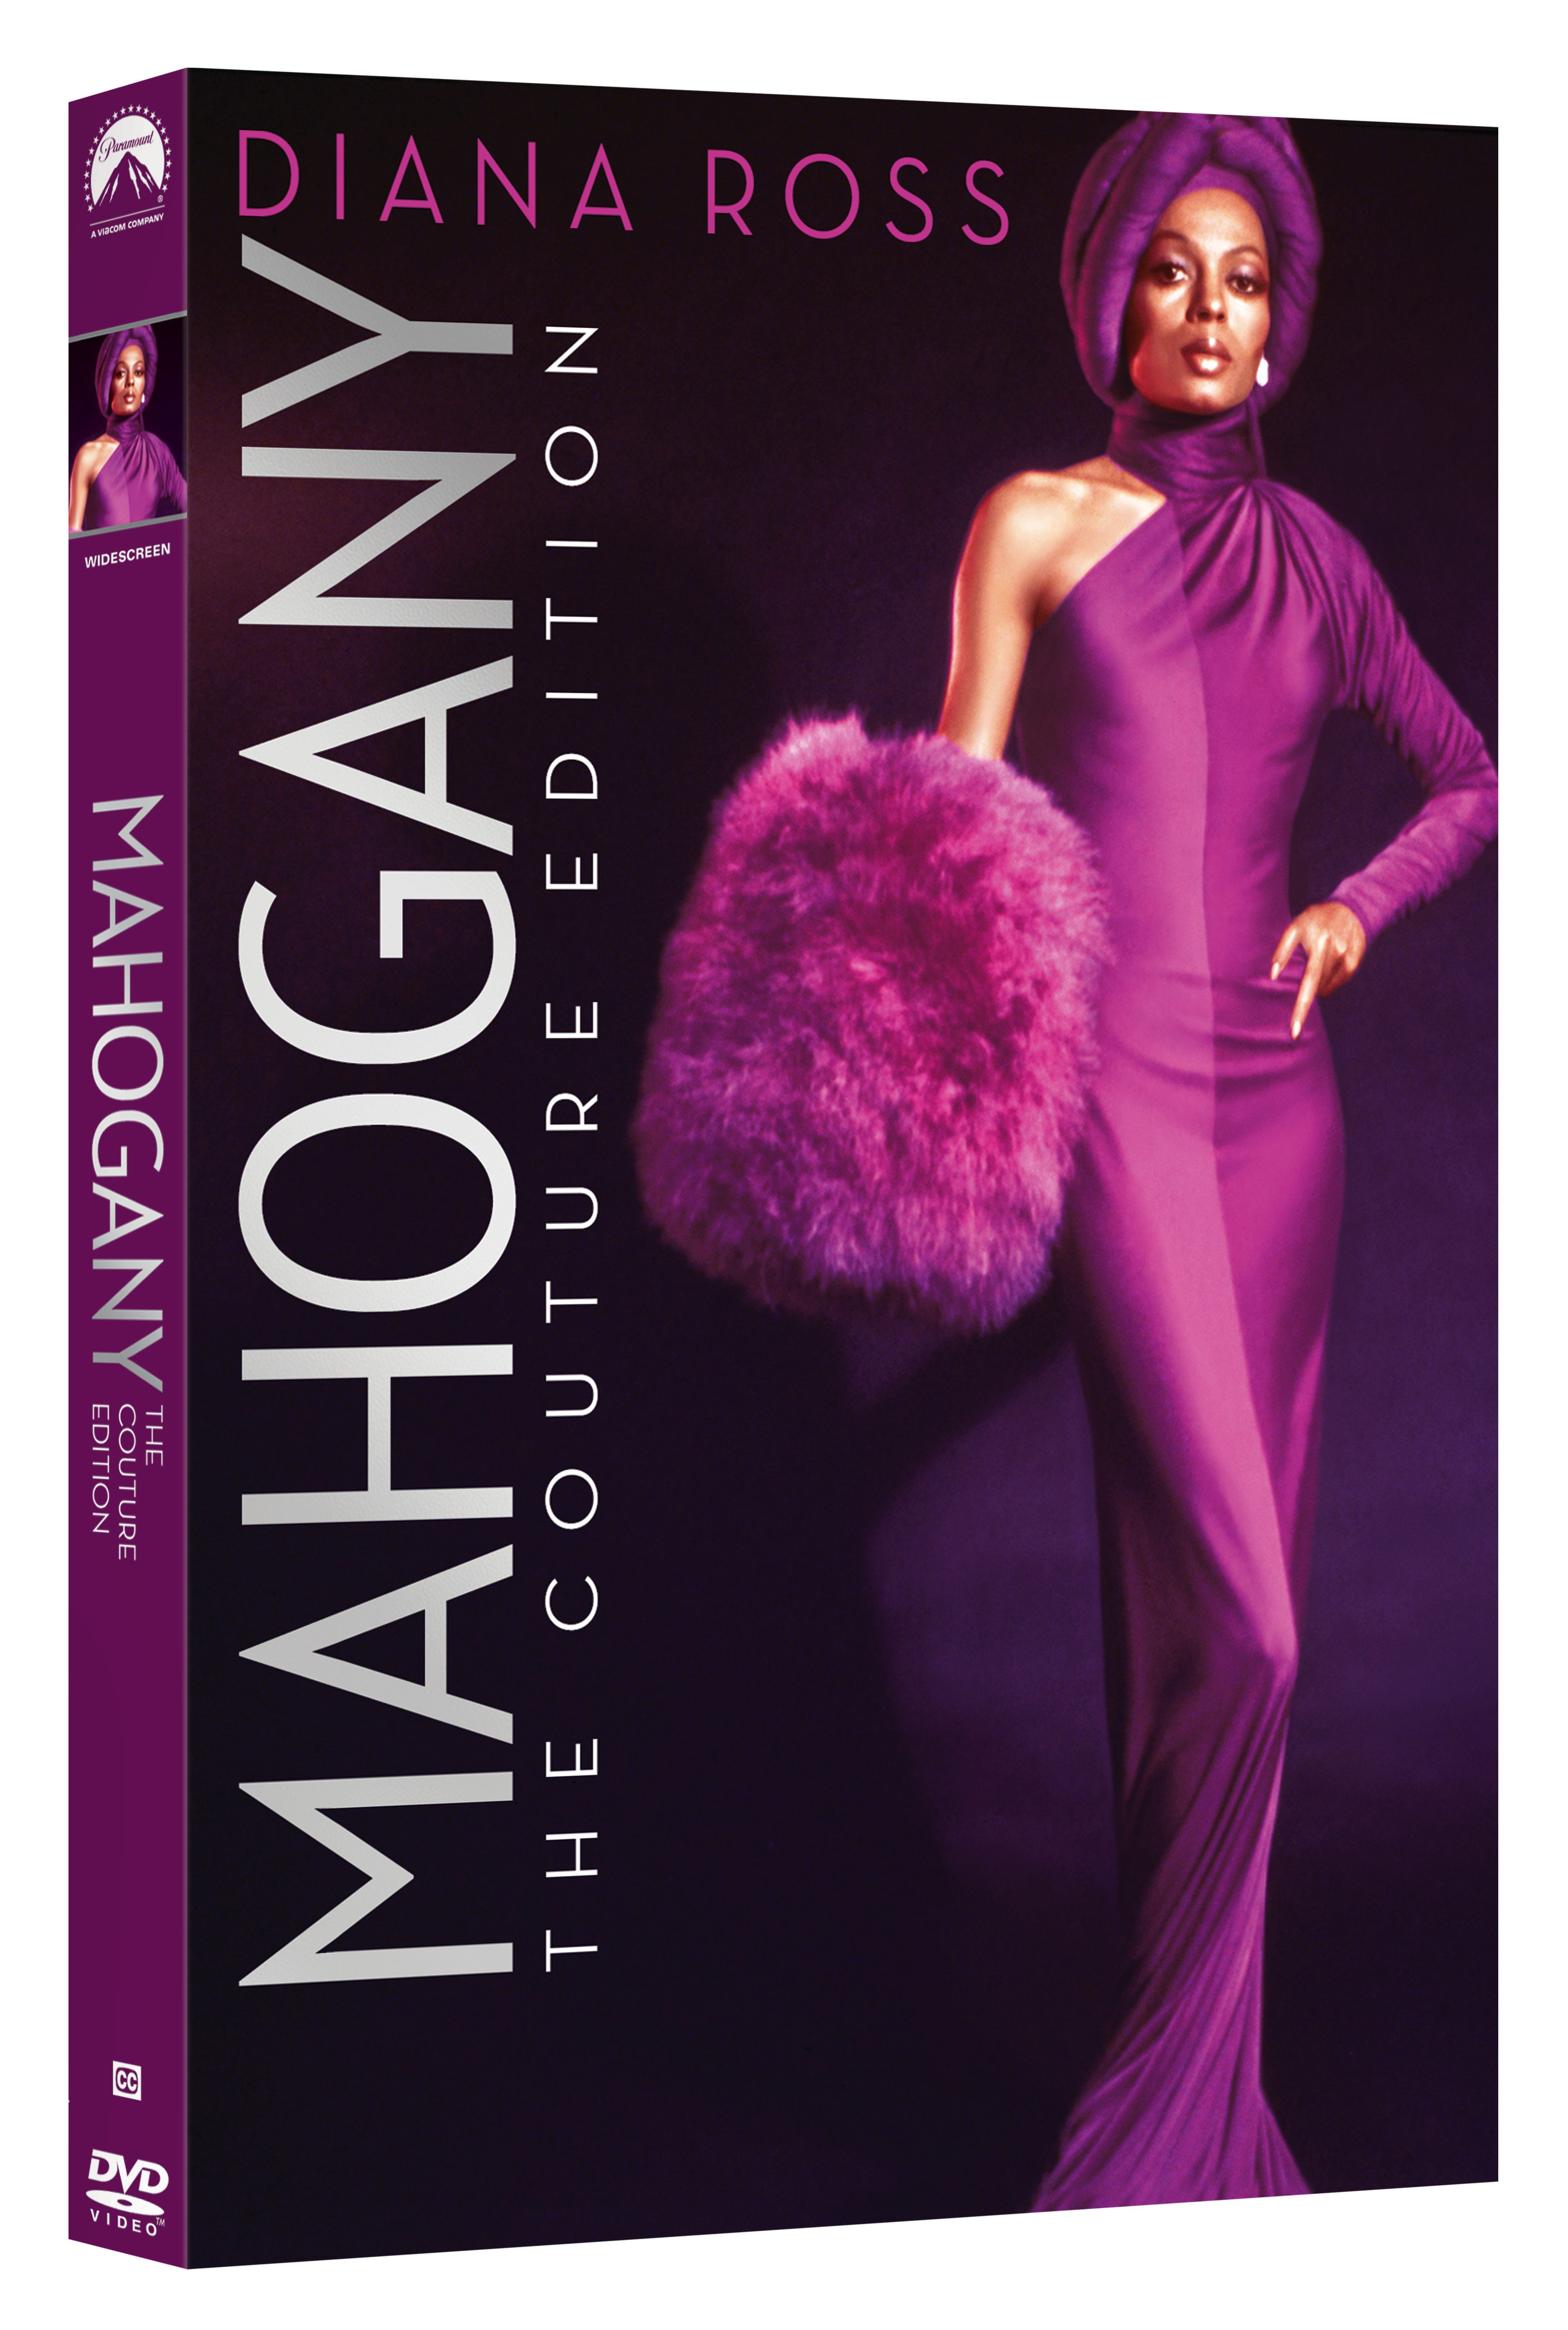 Mahogany DVD Review